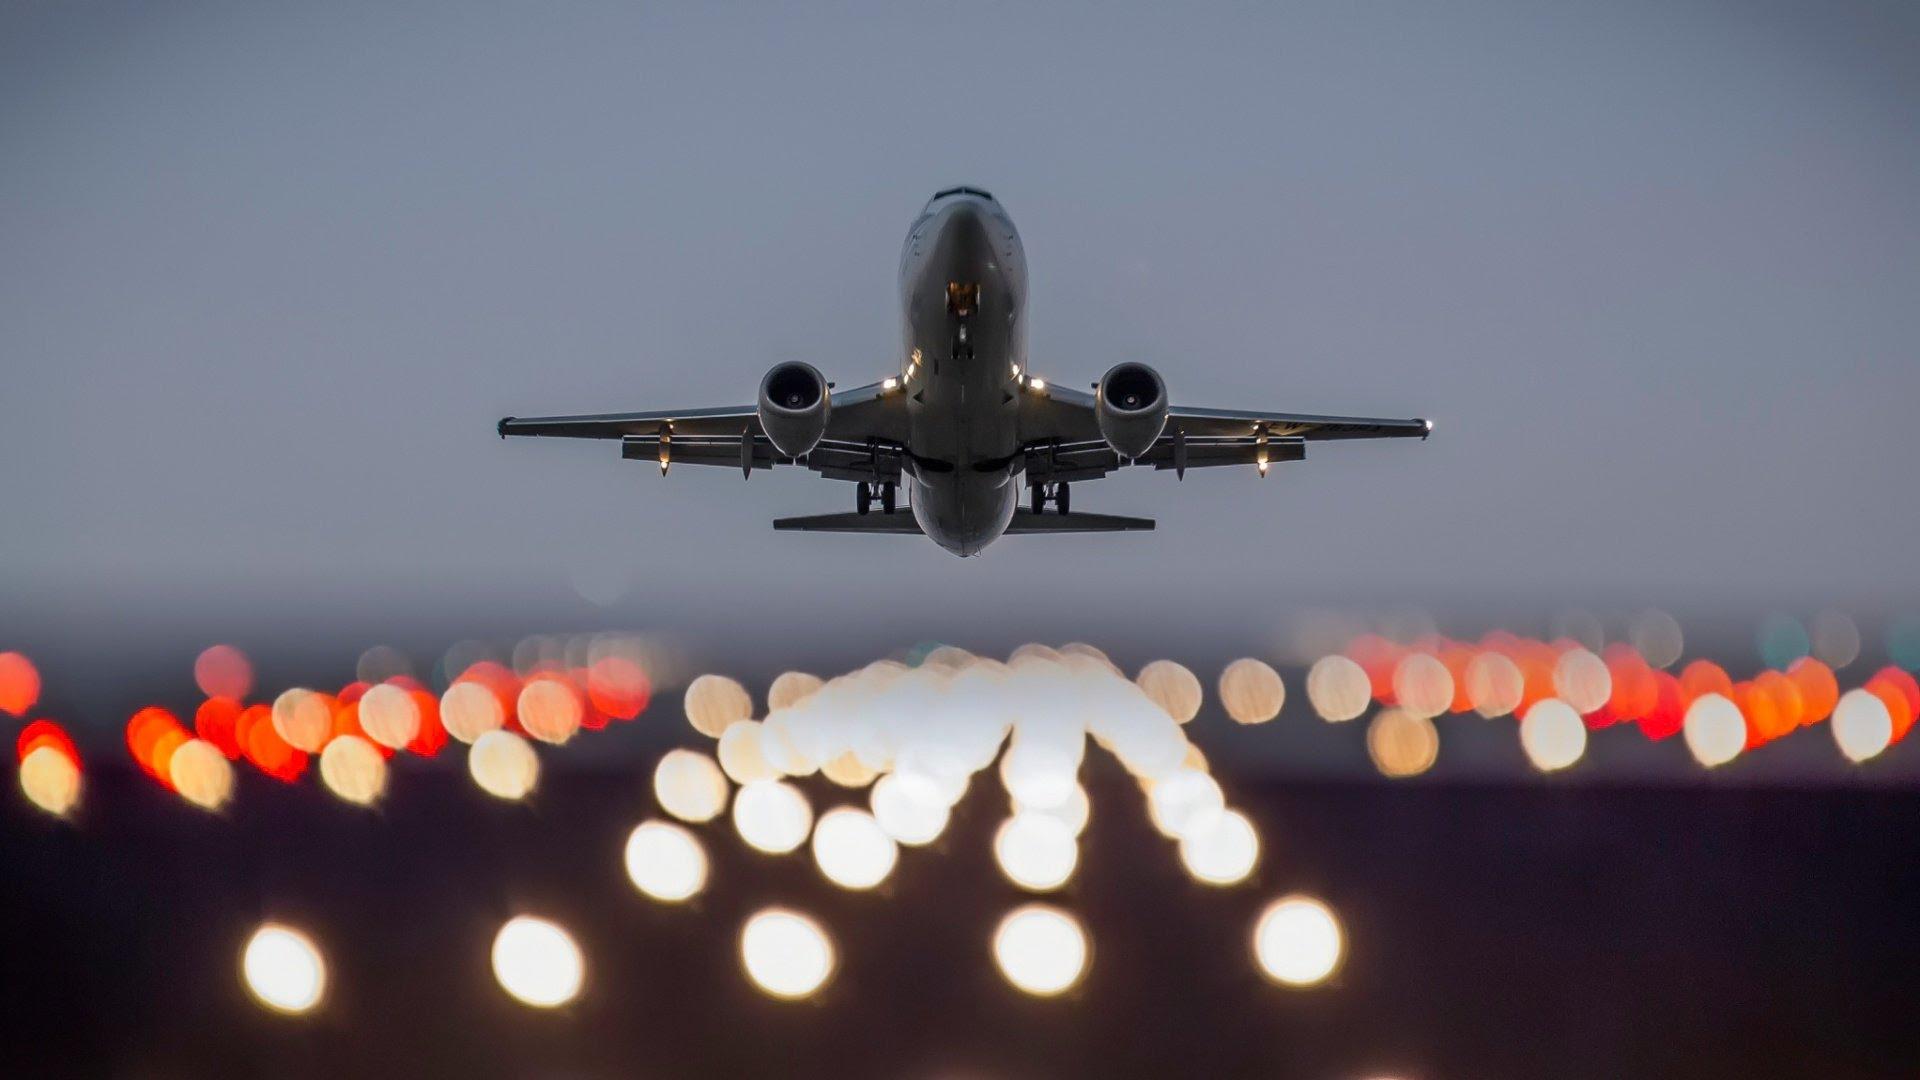 взлет самолета фото